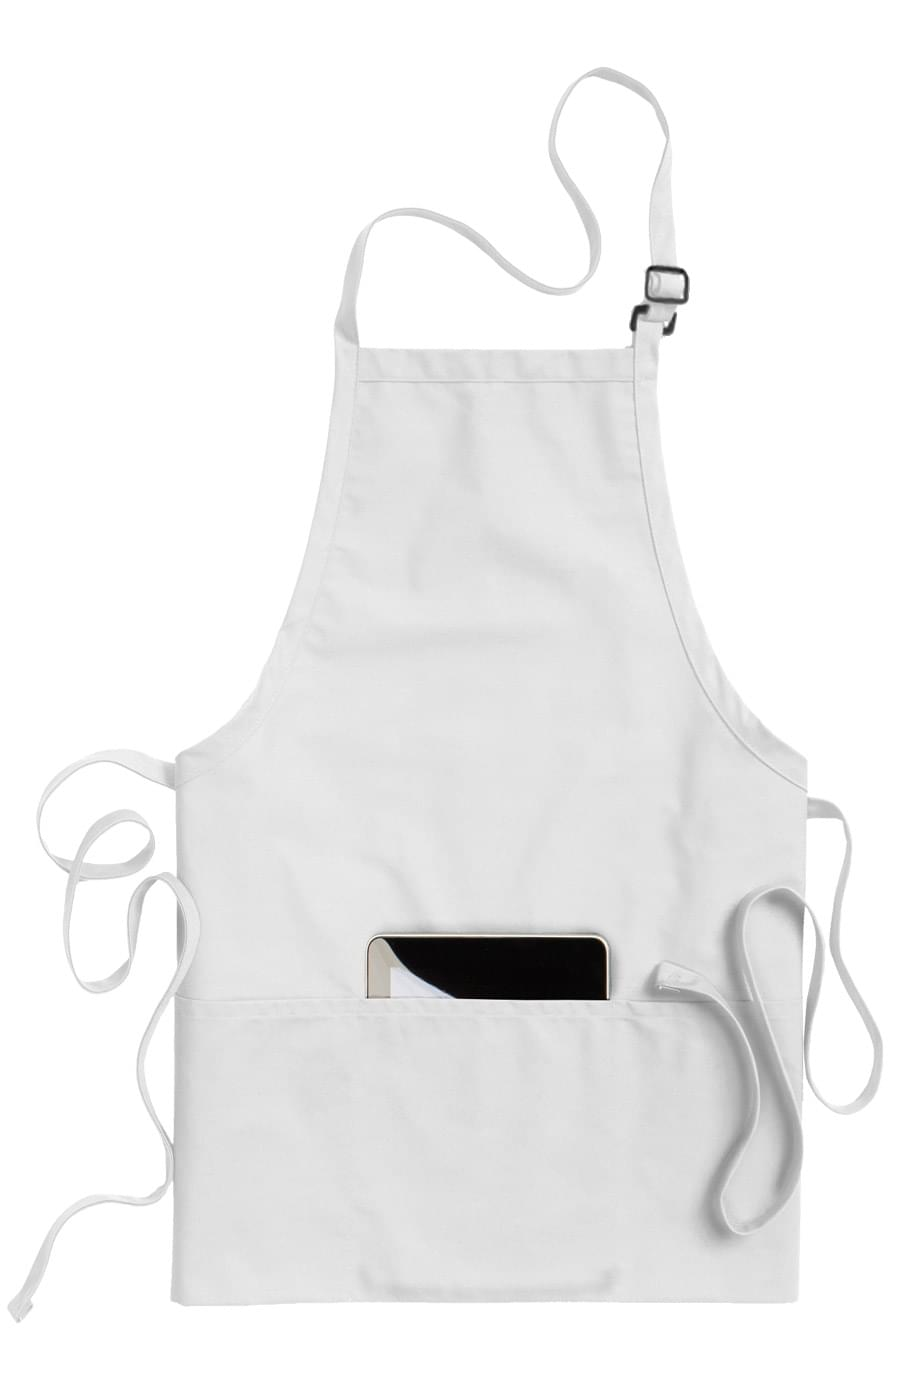 Edwards Garment Adult Three Divisional Pocket Long Ties Kitchen Bib Apron 9002